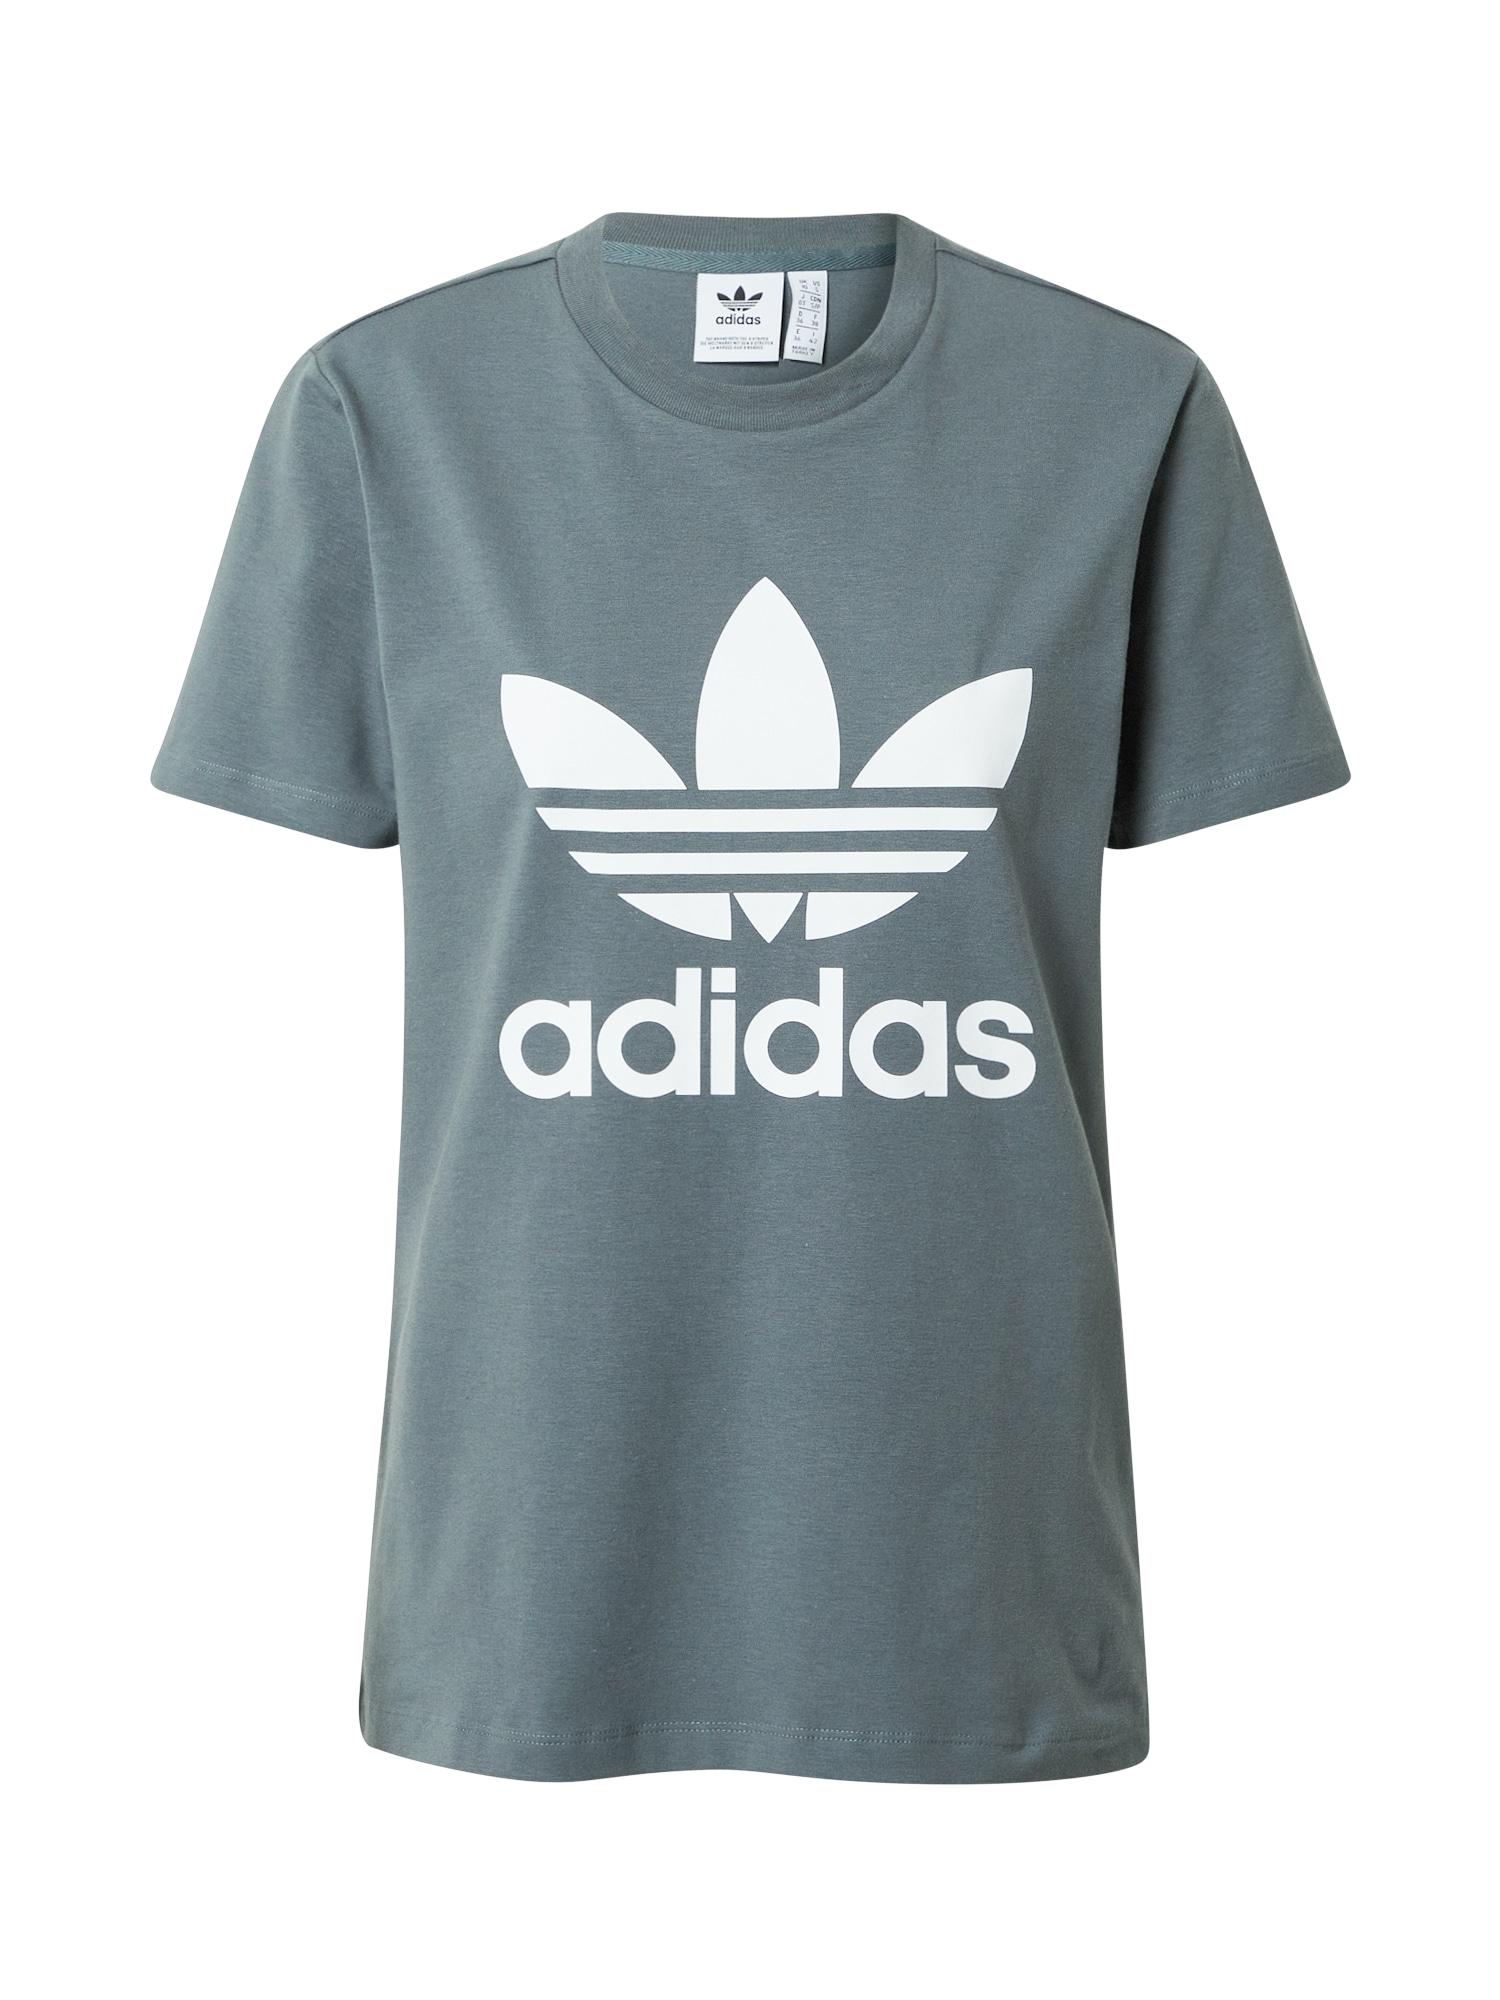 ADIDAS ORIGINALS Marškinėliai pilka / balta